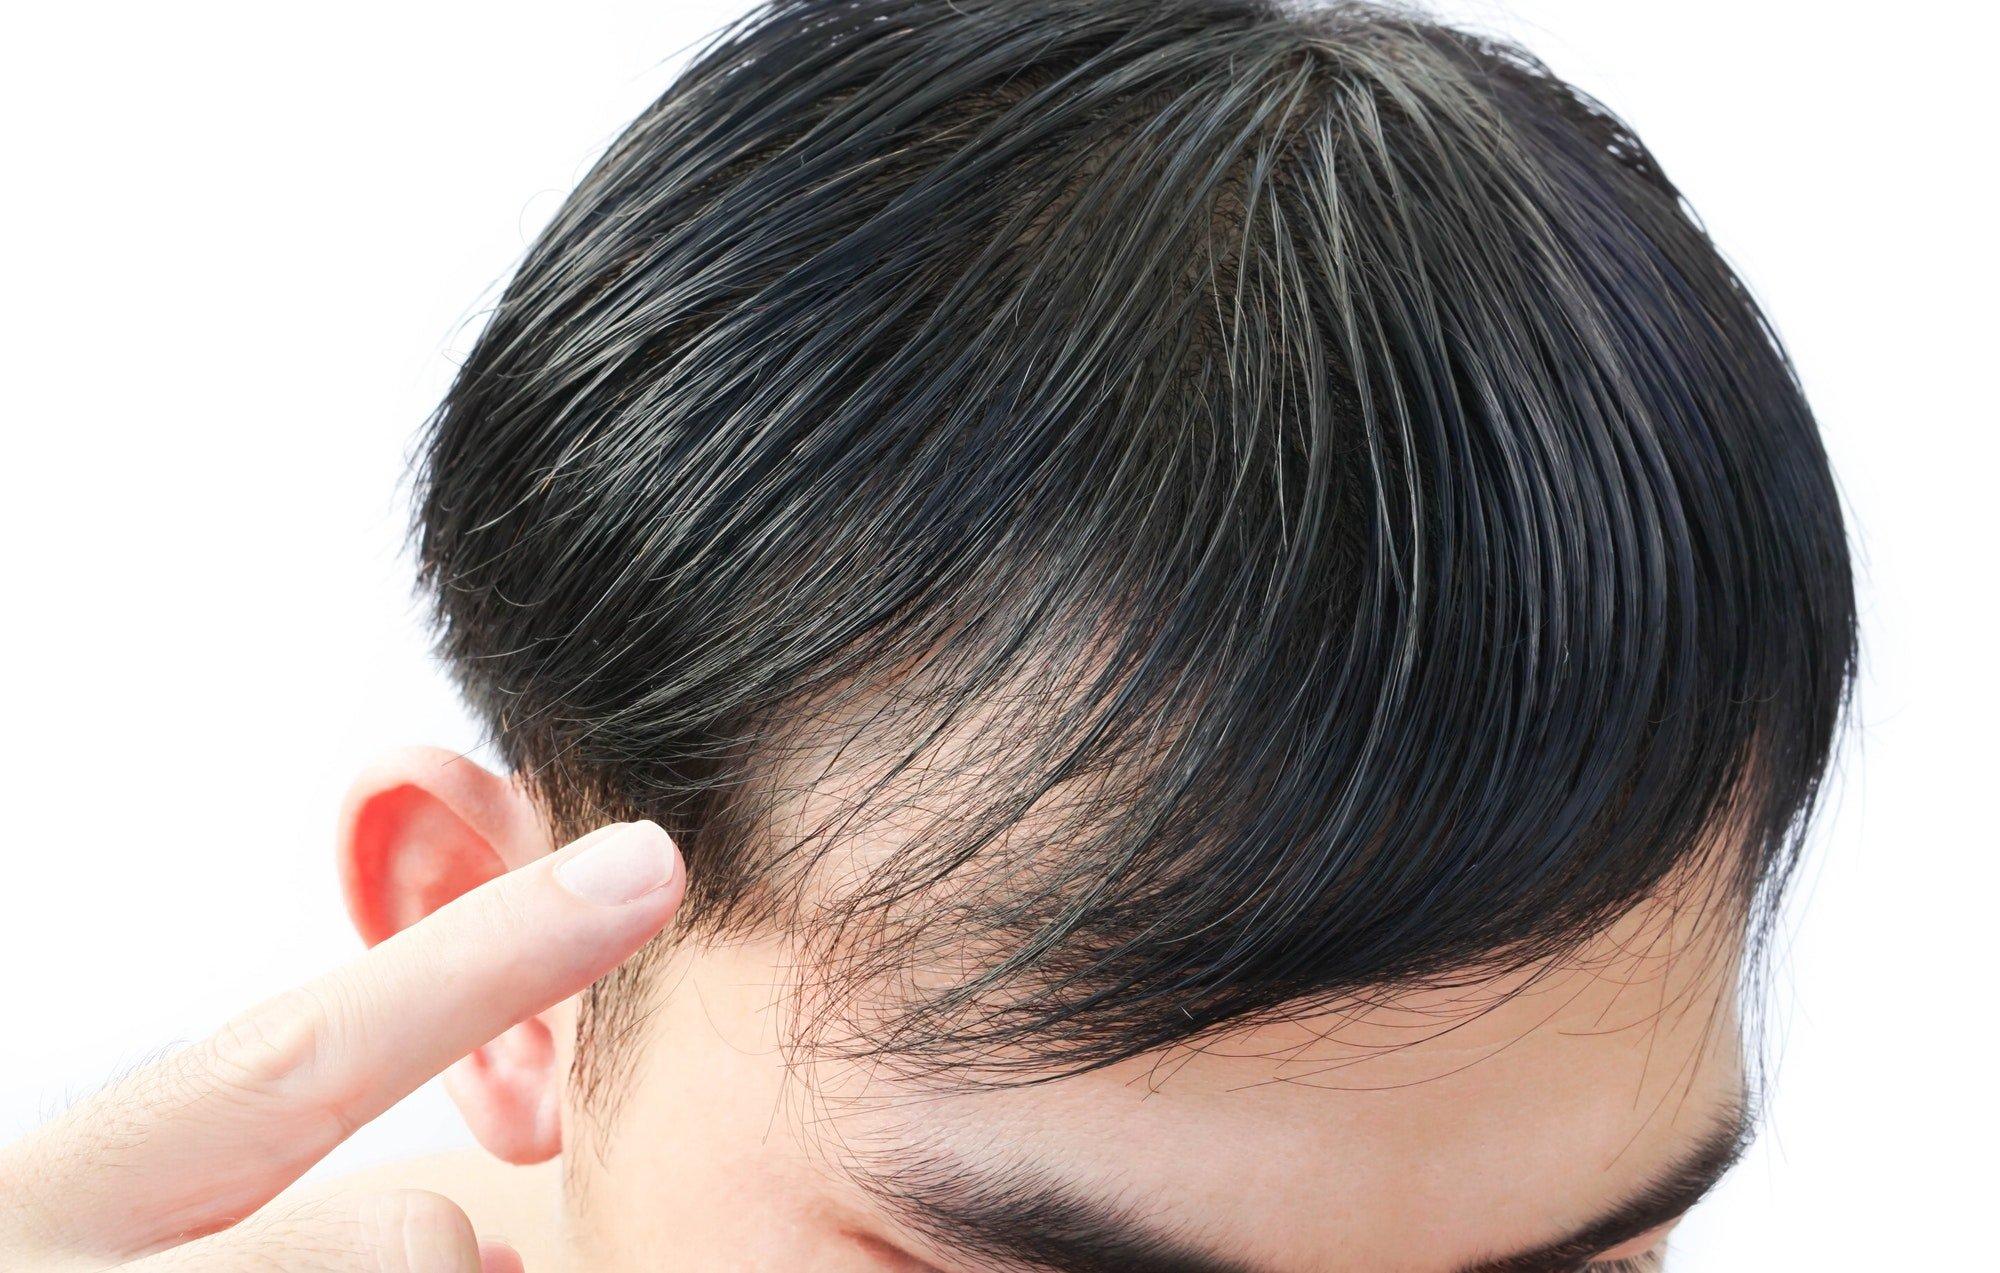 Queda de cabelo - eflúvio ou alopecia?